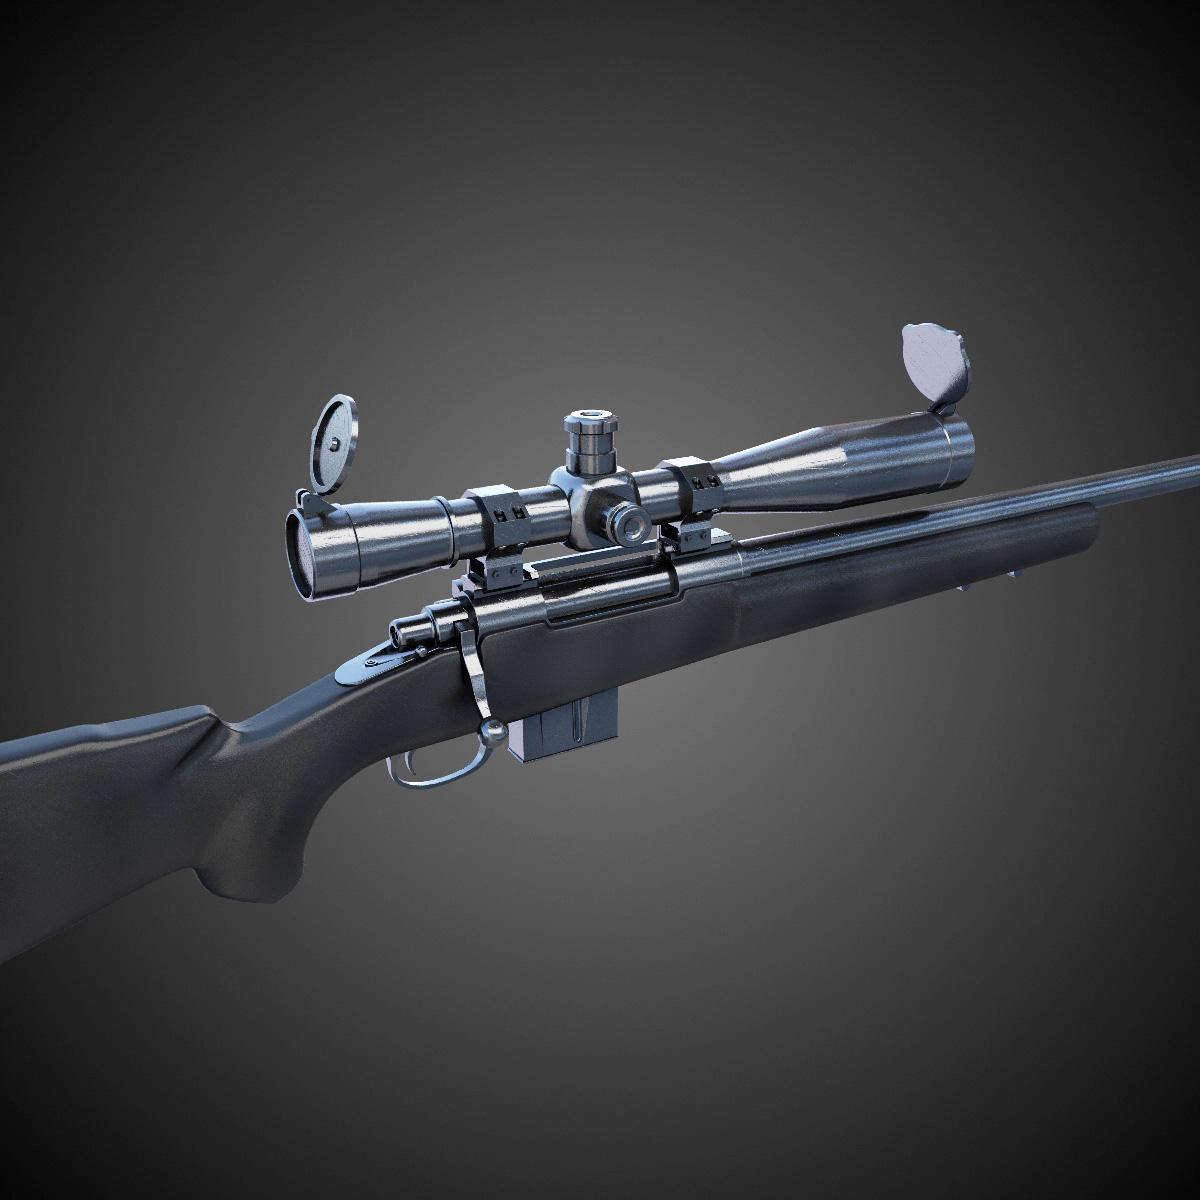 m24a2 sniper rifle - photo #32